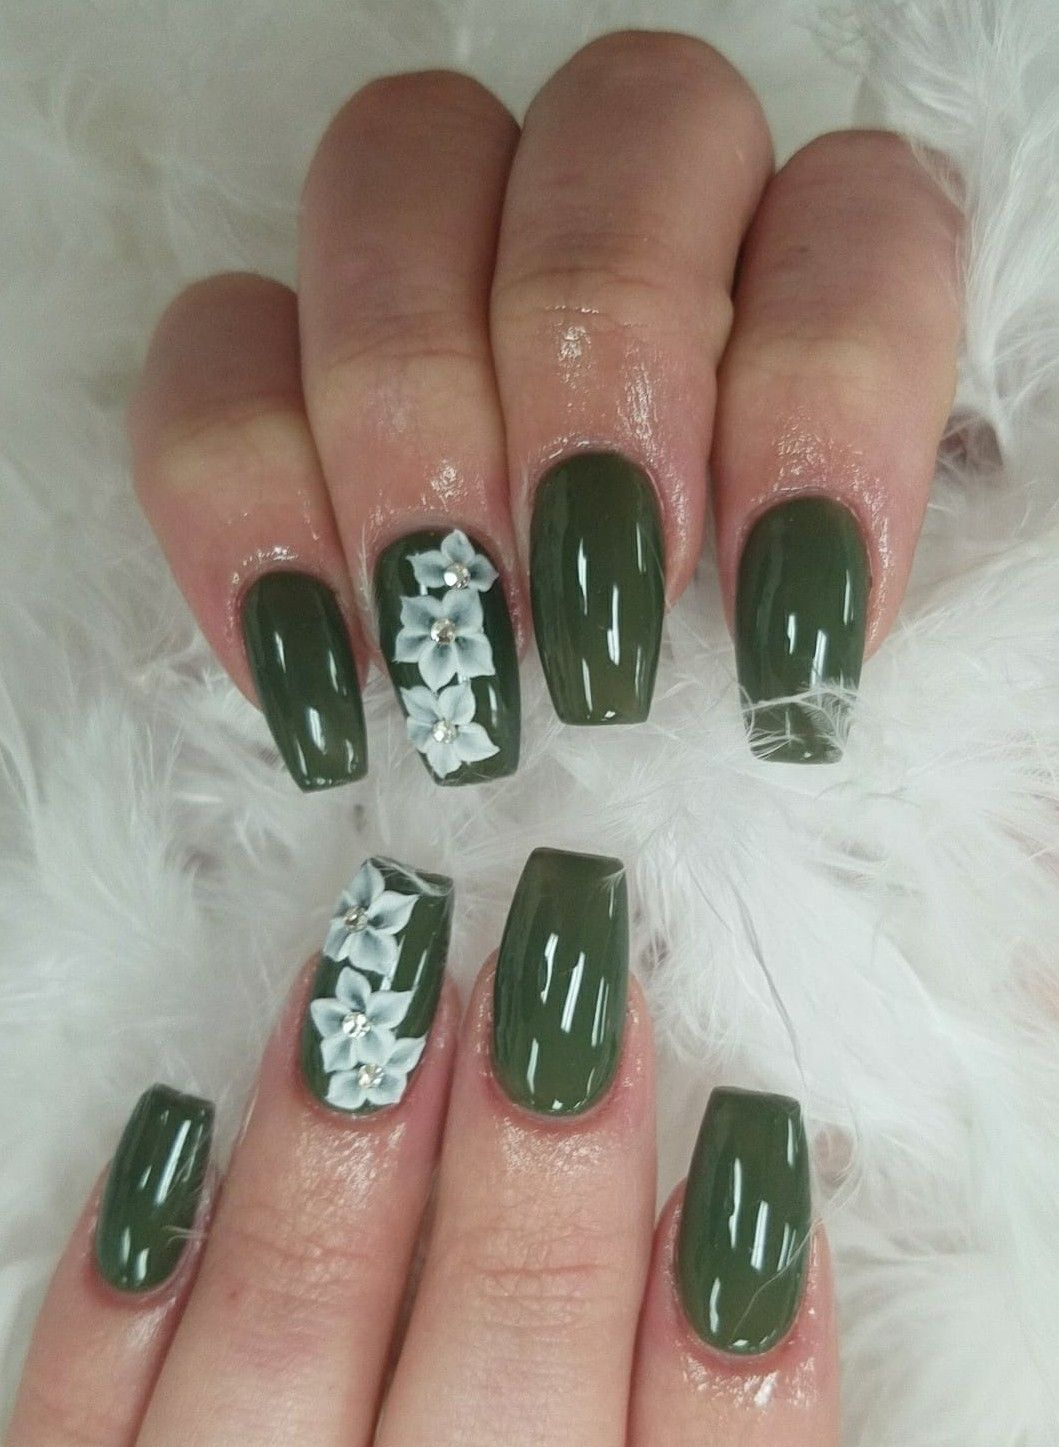 Nailart Flower Green Nails Armygreen 3dnailart 3d White